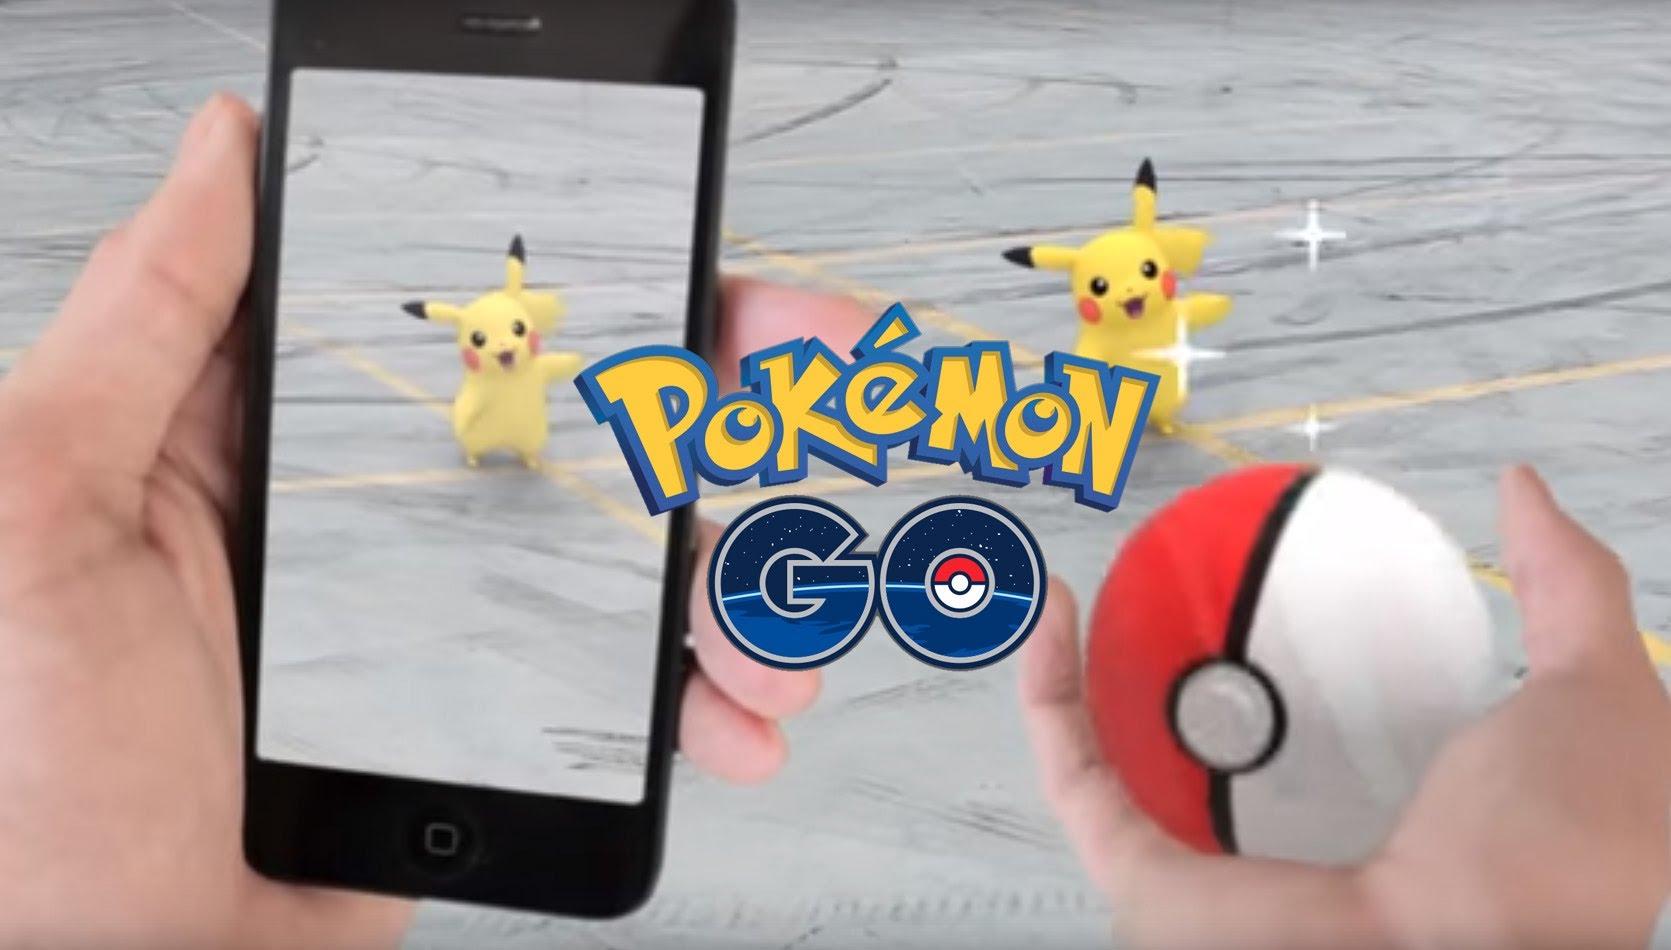 Pokemon go réalité augmentée application iOS android